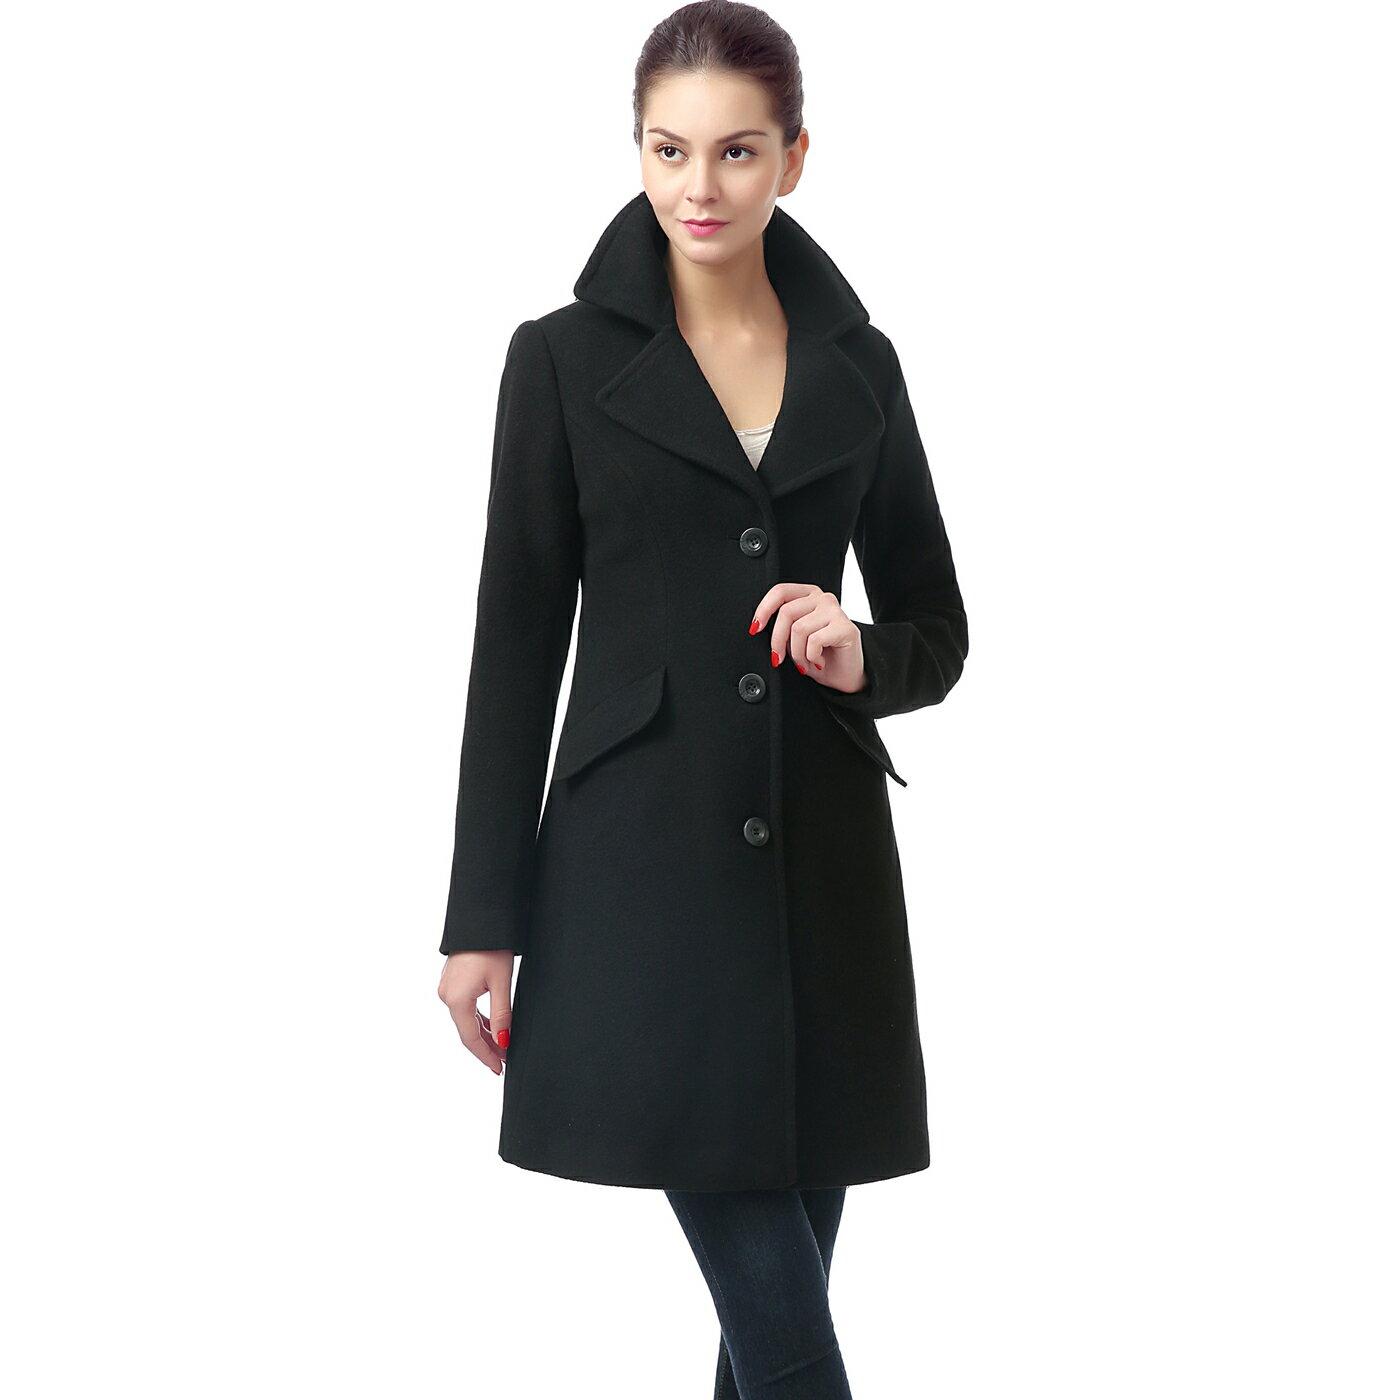 6fa72de1c91 Luxury lane womens sasha wool blend walking coat jpg 1400x1400 Bgsd coats